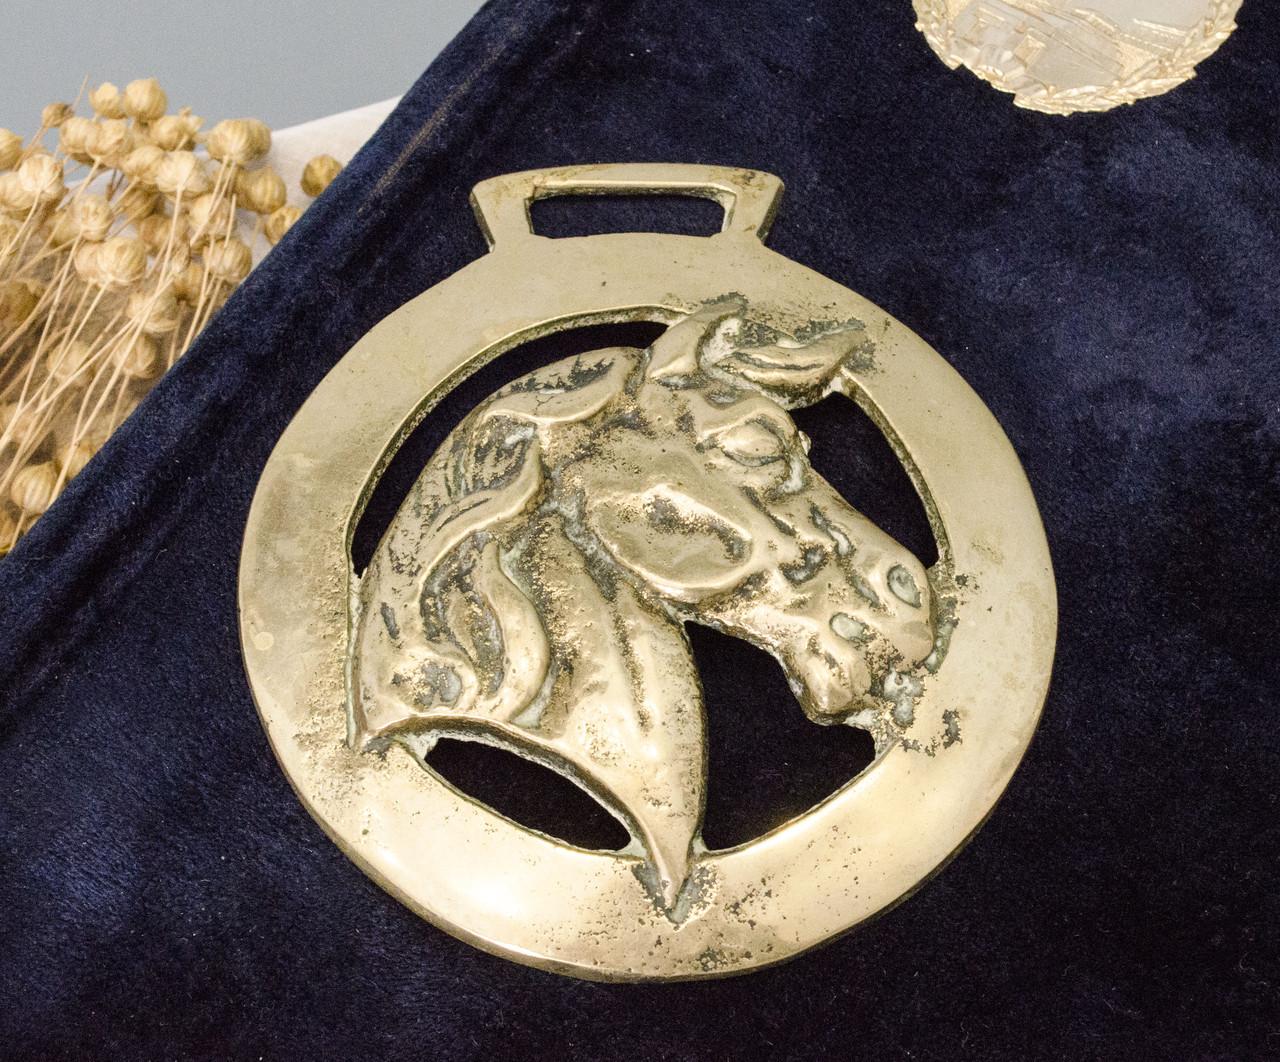 Латунная накладка для конской сбруи, винтаж, латунь, Англия, лошадь